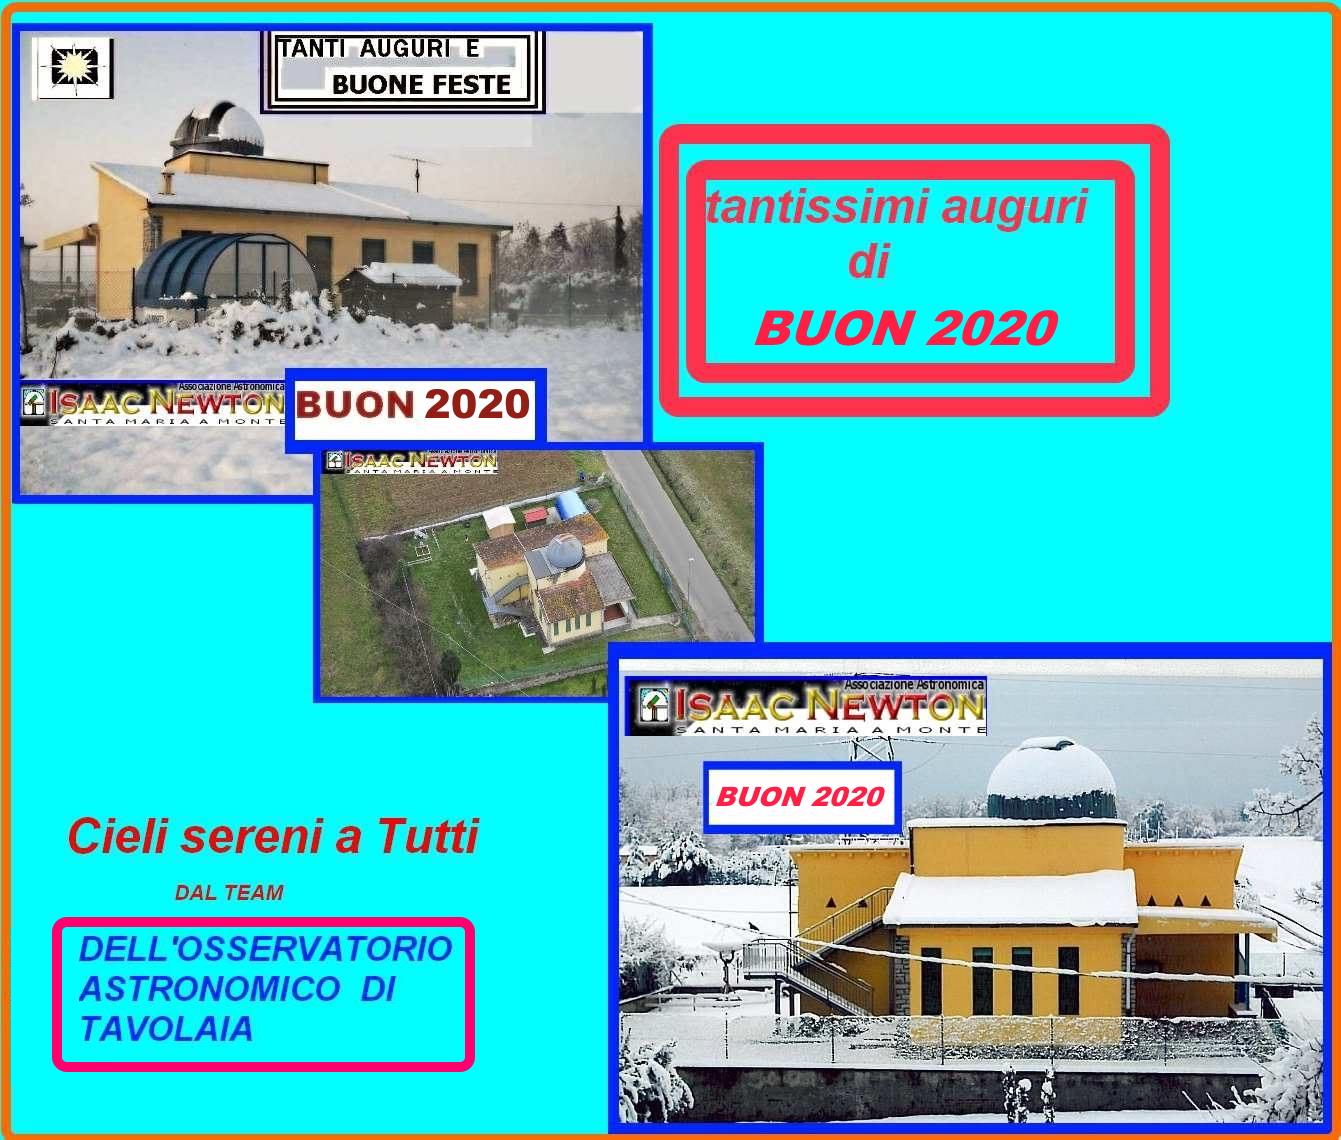 buon-anno2020-tavolaia-observatory.jpg